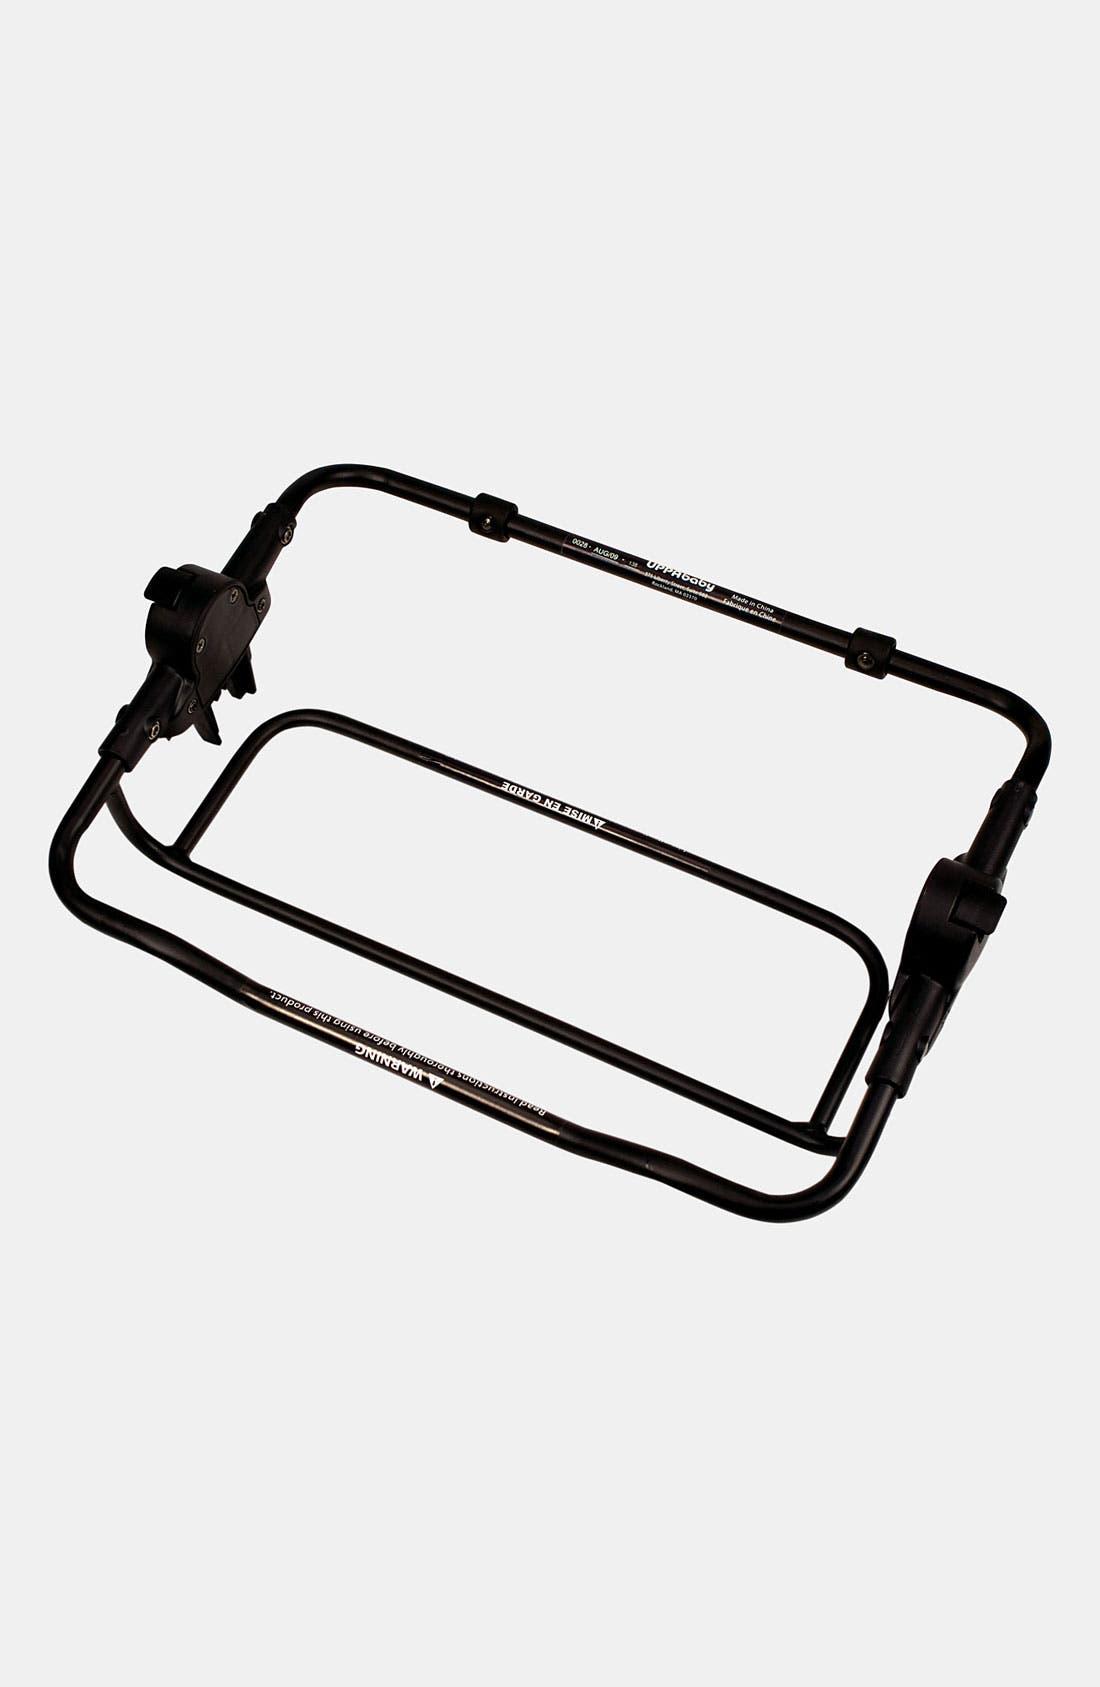 Alternate Image 1 Selected - UPPAbaby VISTA Stroller to Peg Perego™ Car Seat Adaptor